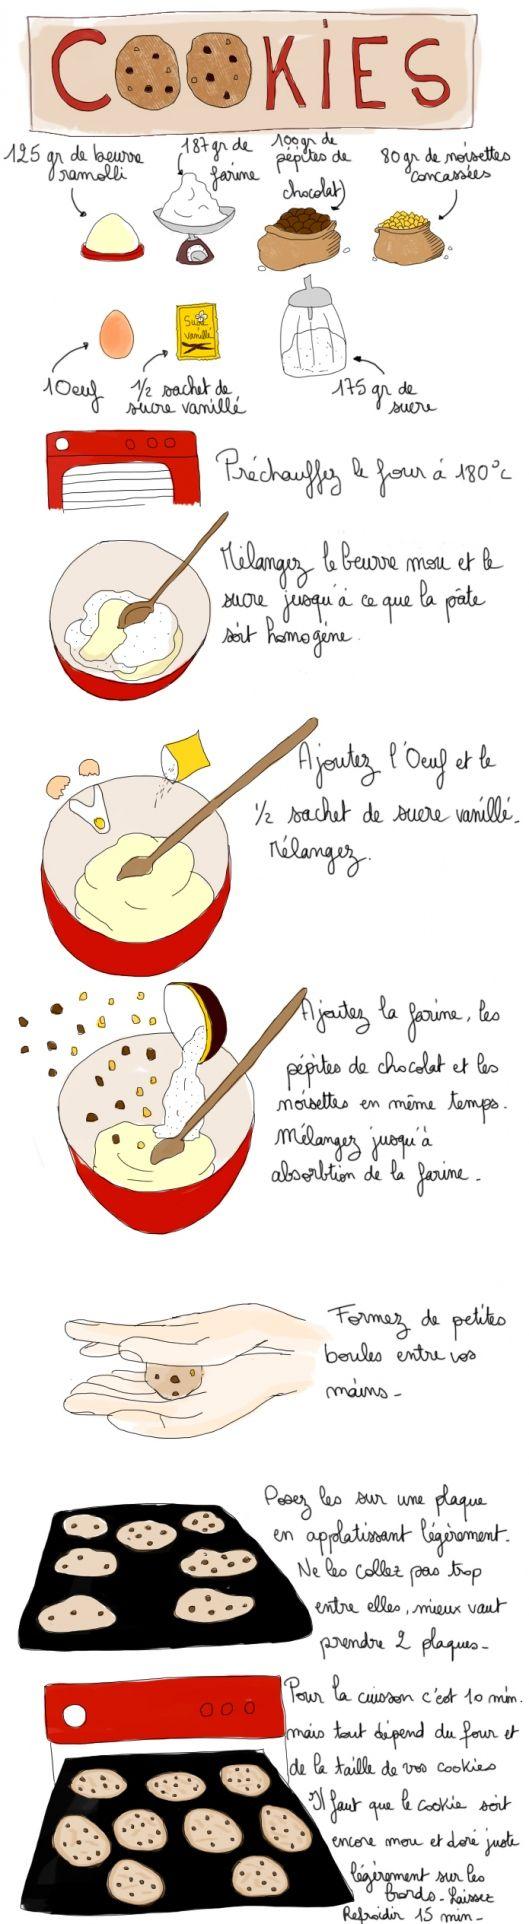 Cookies cookies - Cuisiner des aubergines facile ...